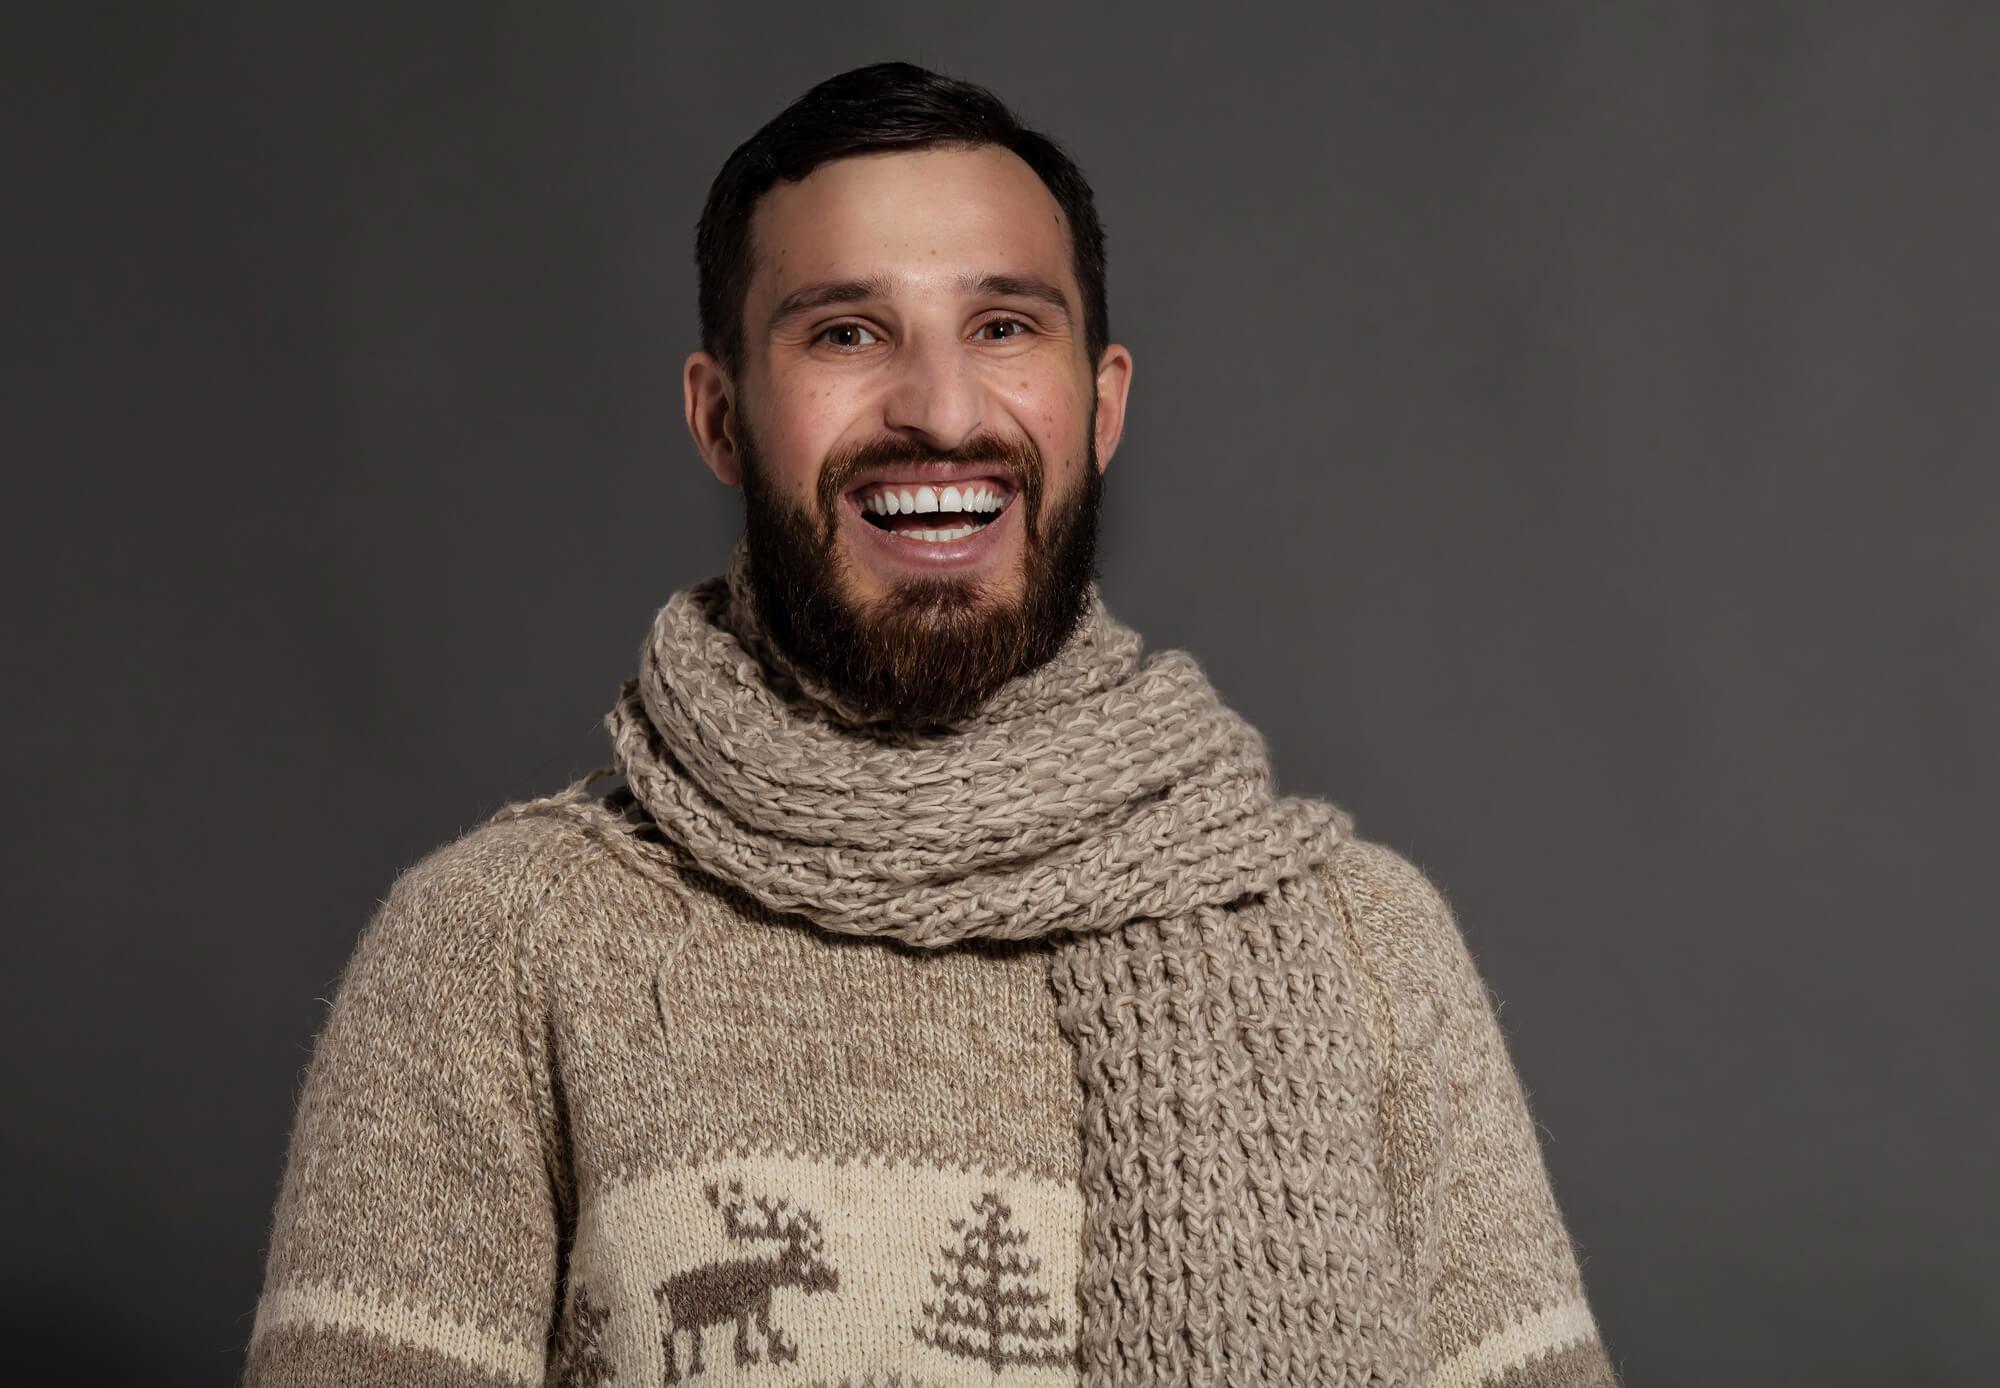 Jak nosić szalik męski